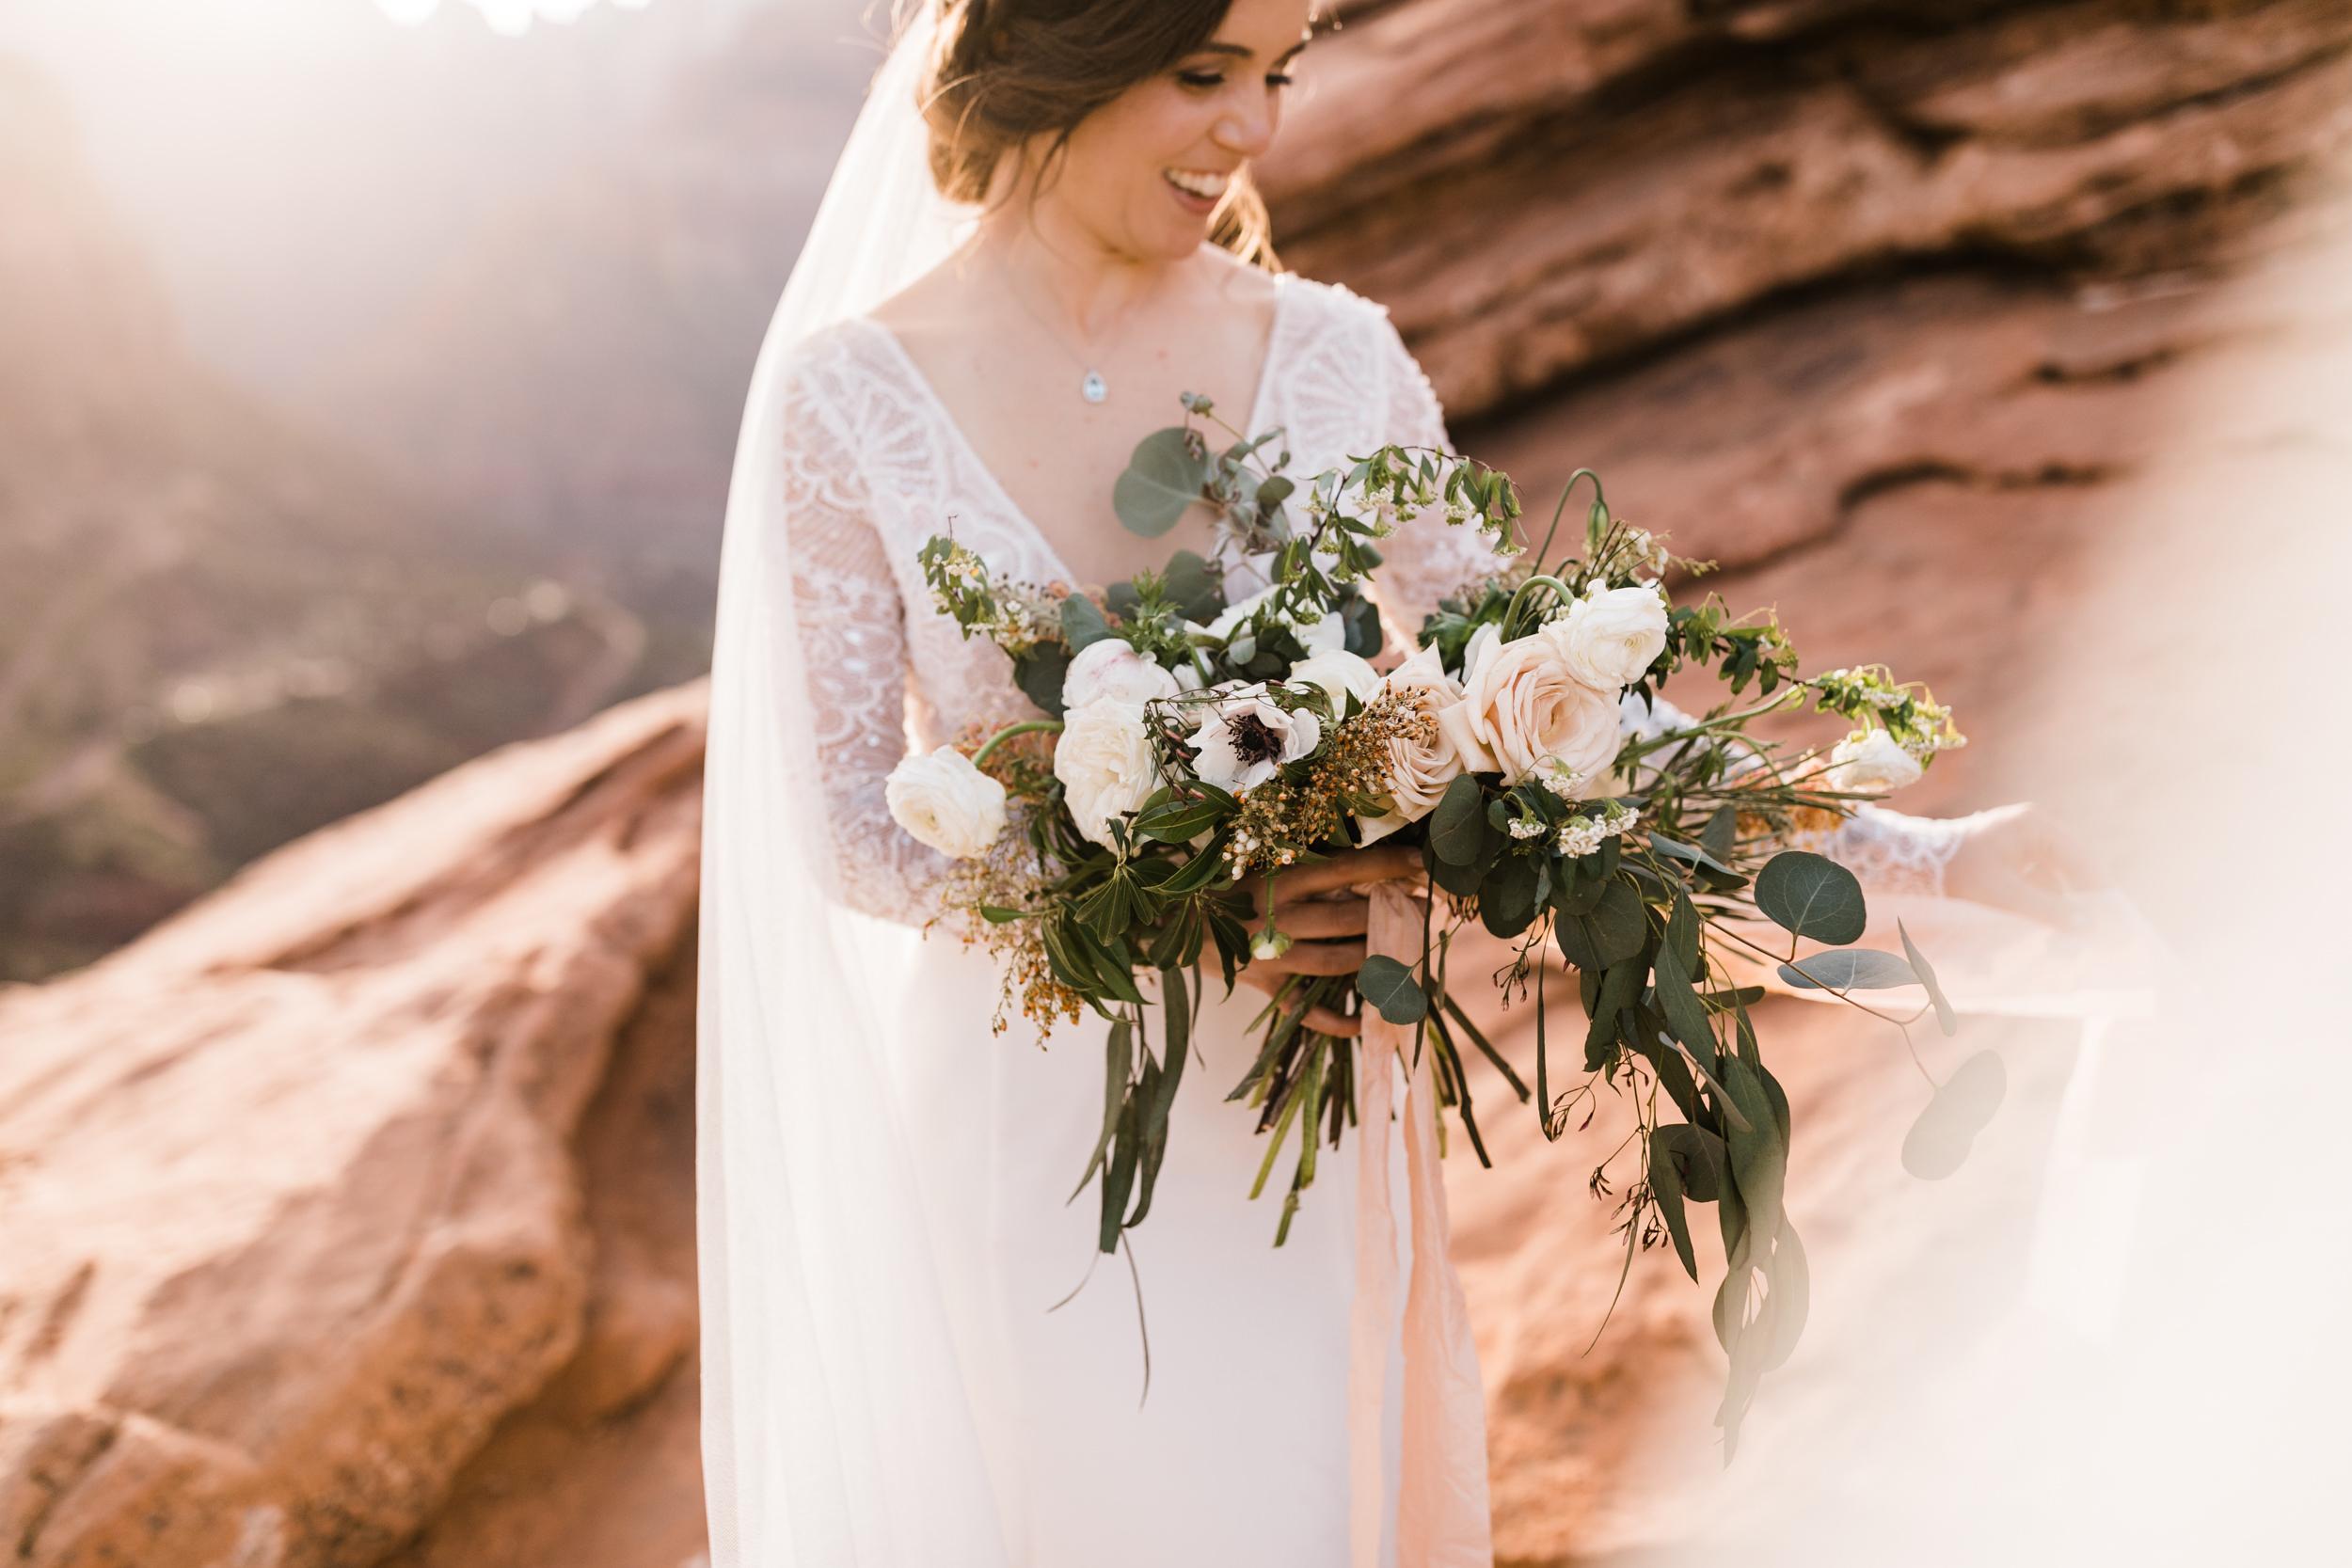 Zion-National-Park-Adventure-Wedding-Hearnes-Elopement-Photography-39.jpg